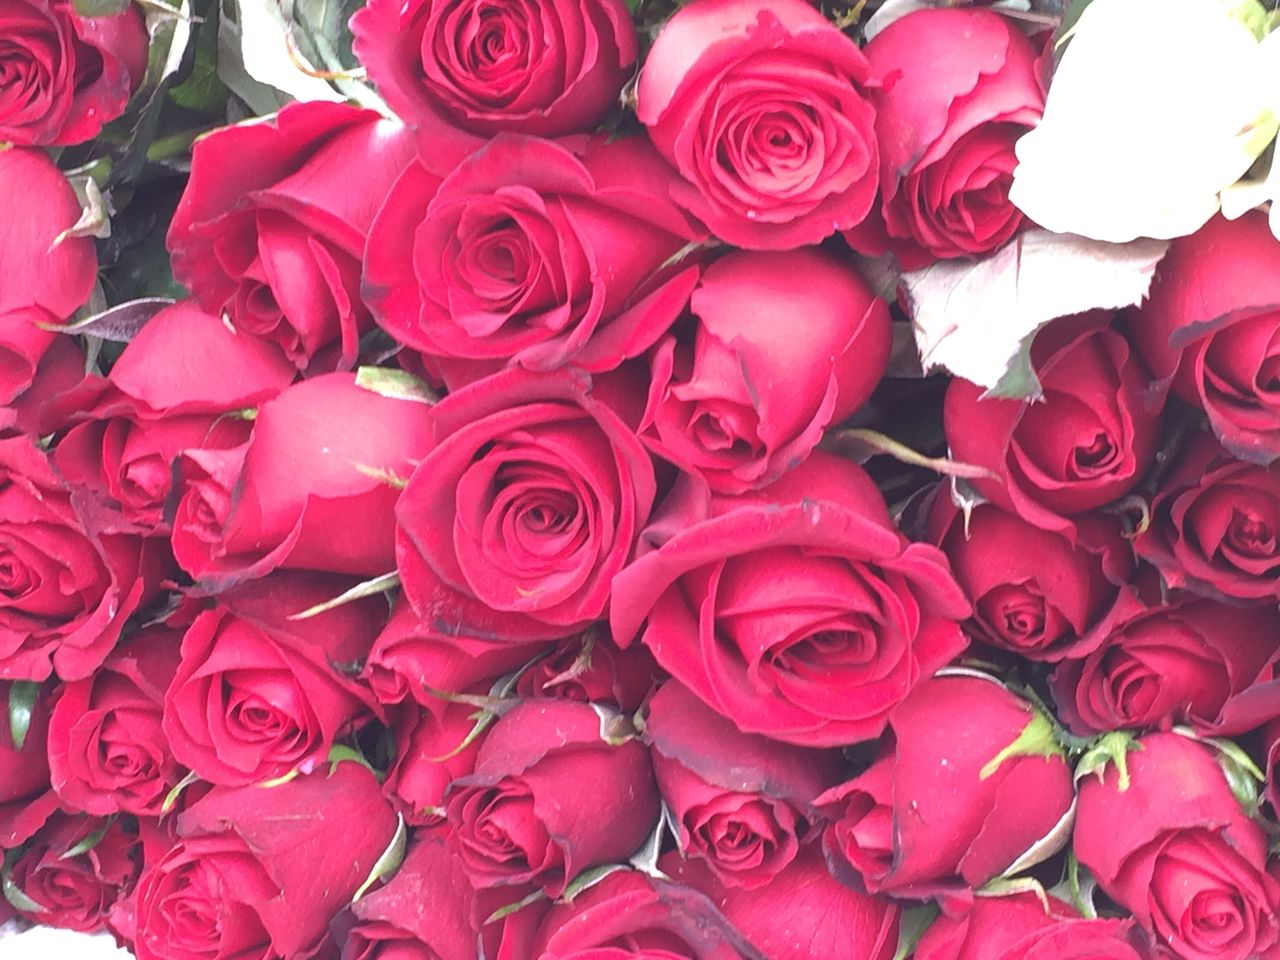 flower, rose - flower, petal, bouquet, flower head, fragility, beauty in nature, full frame, backgrounds, freshness, nature, red, no people, flower market, close-up, flower shop, rose petals, beauty, gift, day, indoors, florist